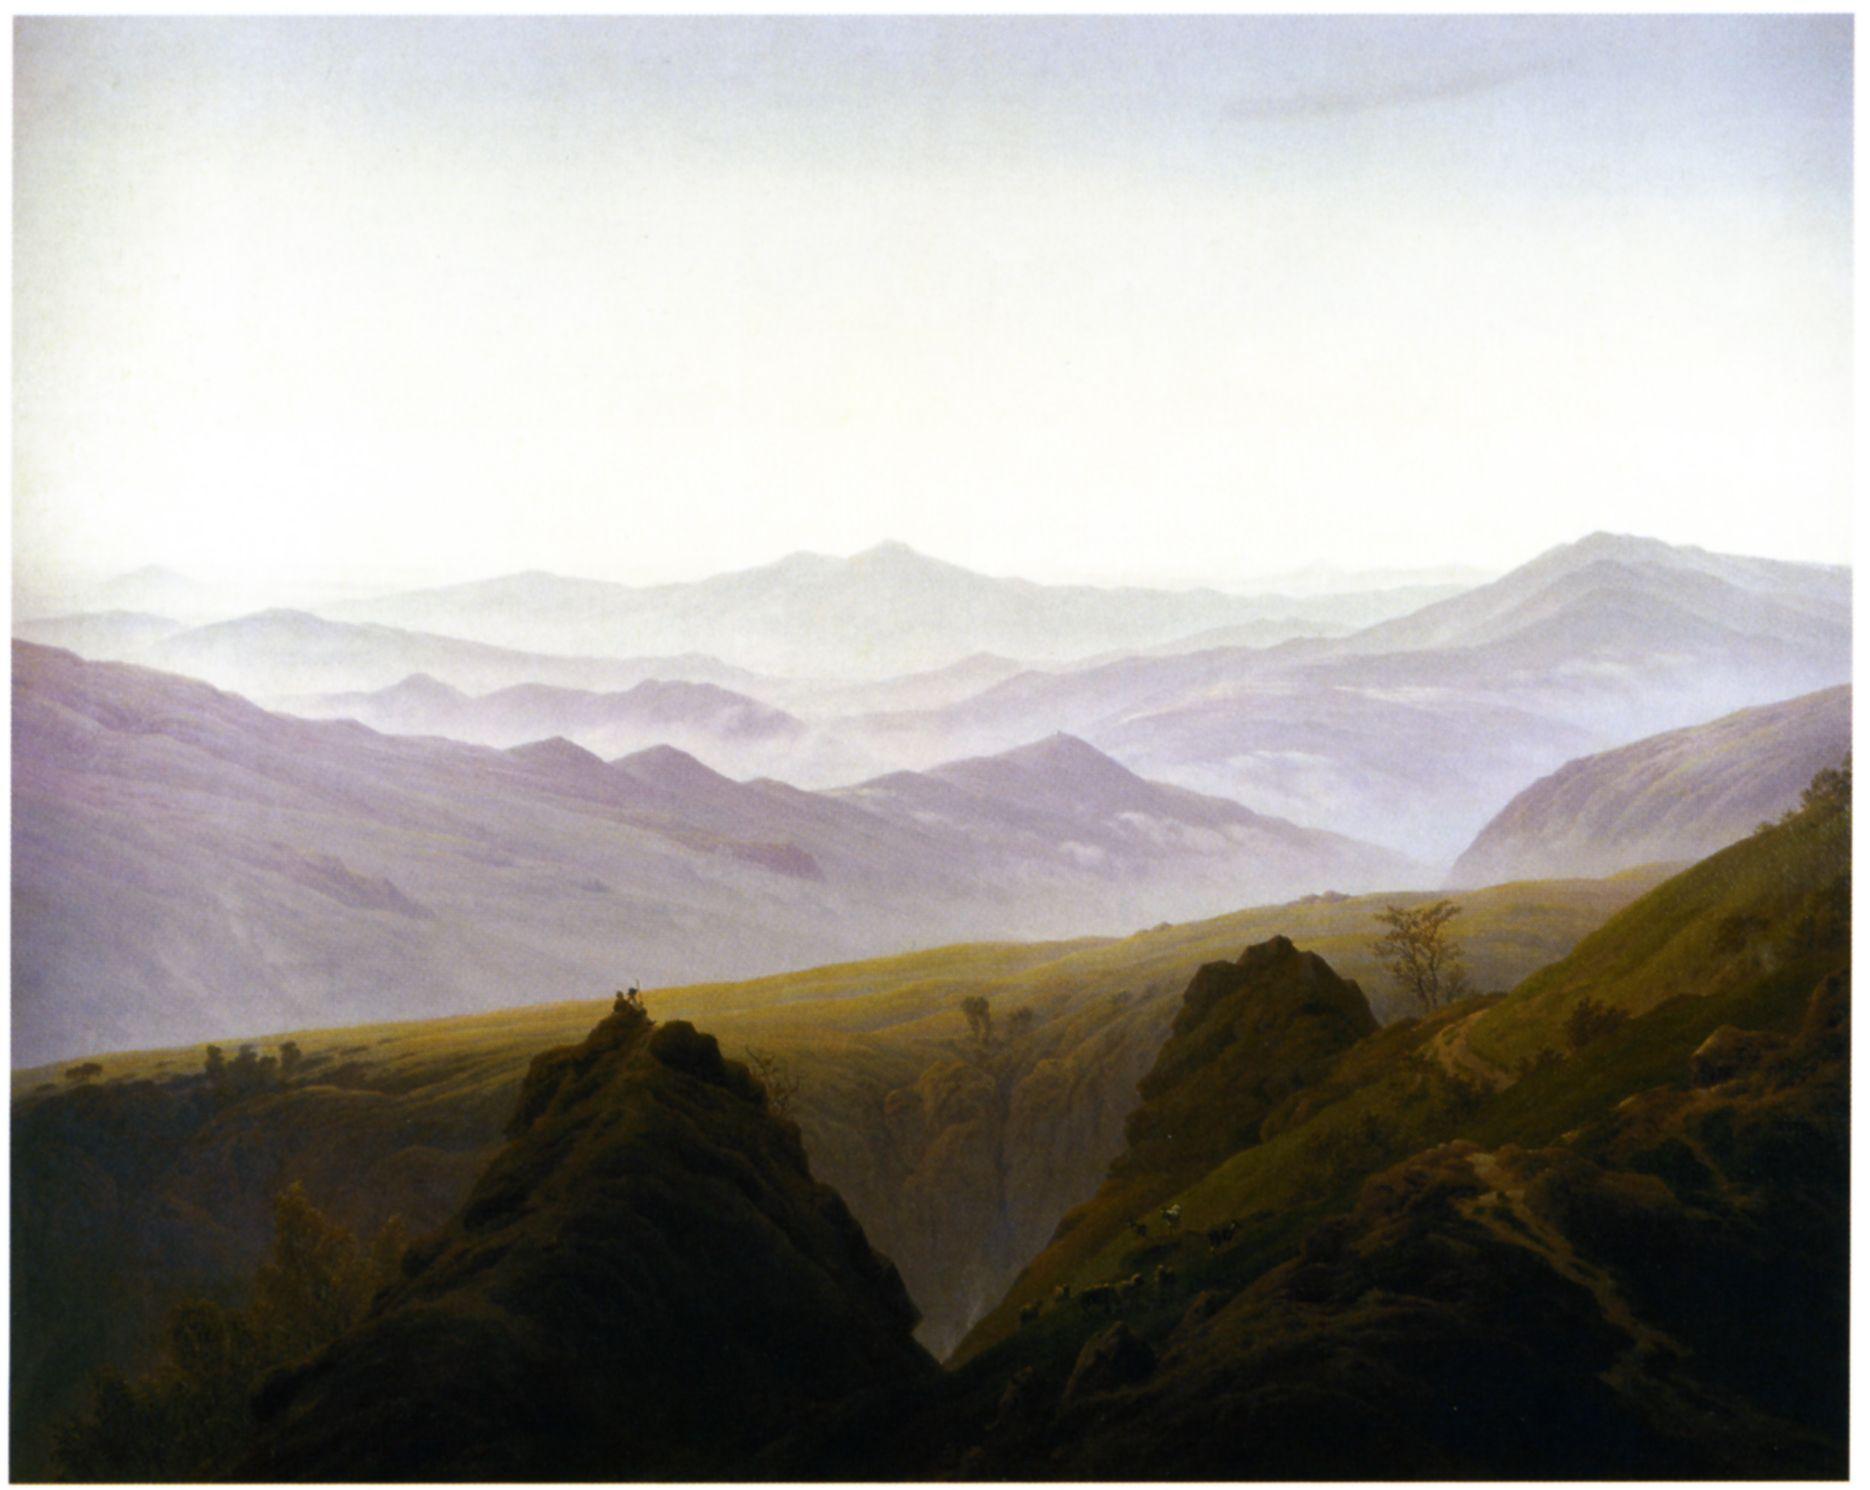 Landschaftsmalerei romantik friedrich  Caspar David Friedrich | Caspar David Friedrich 1774-1840 ...